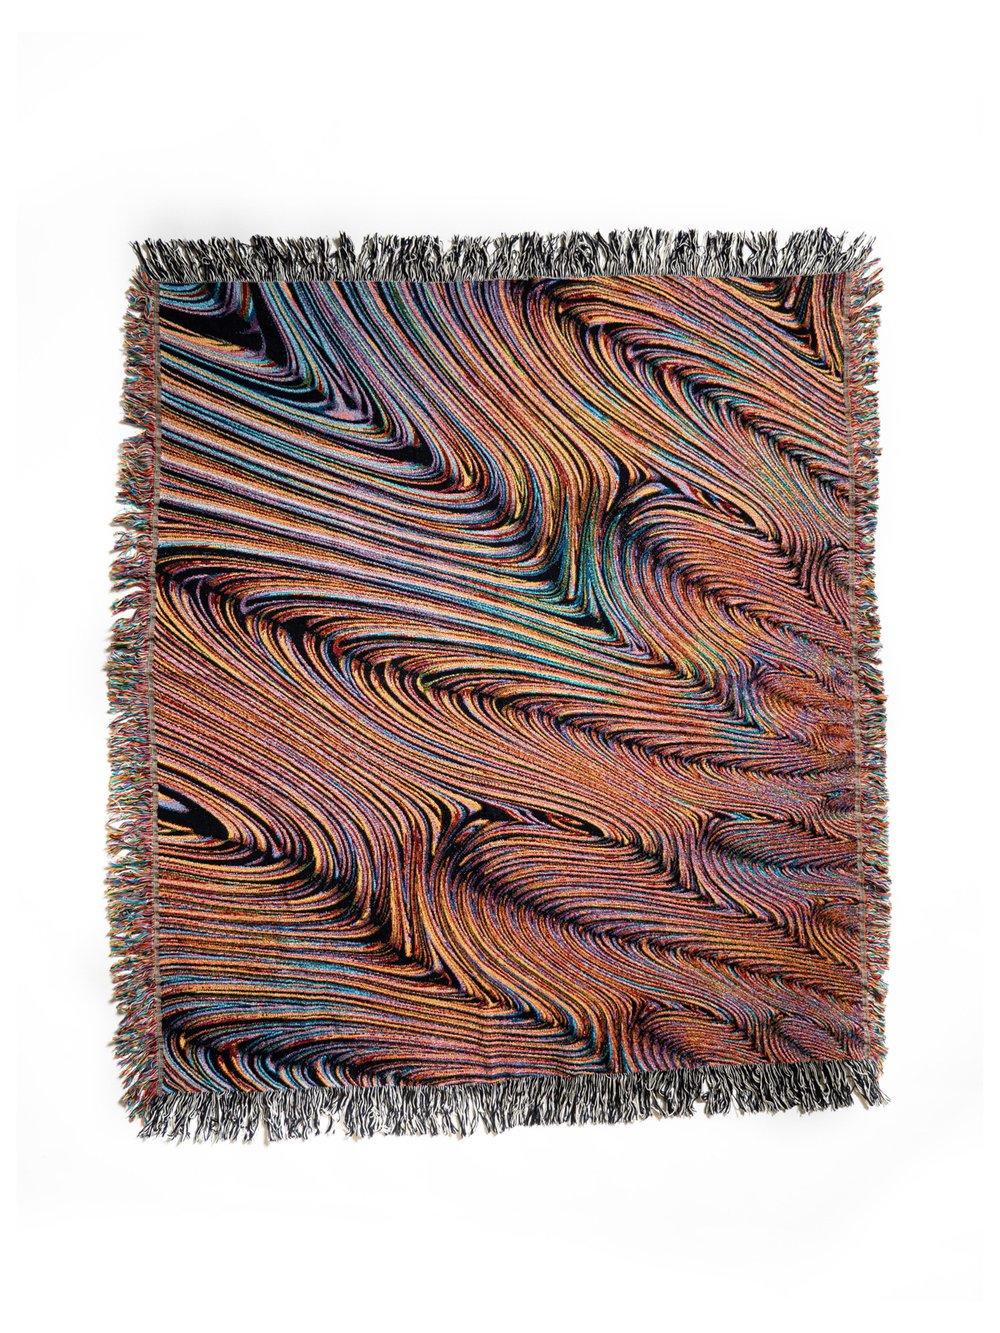 Woven Blanket #2